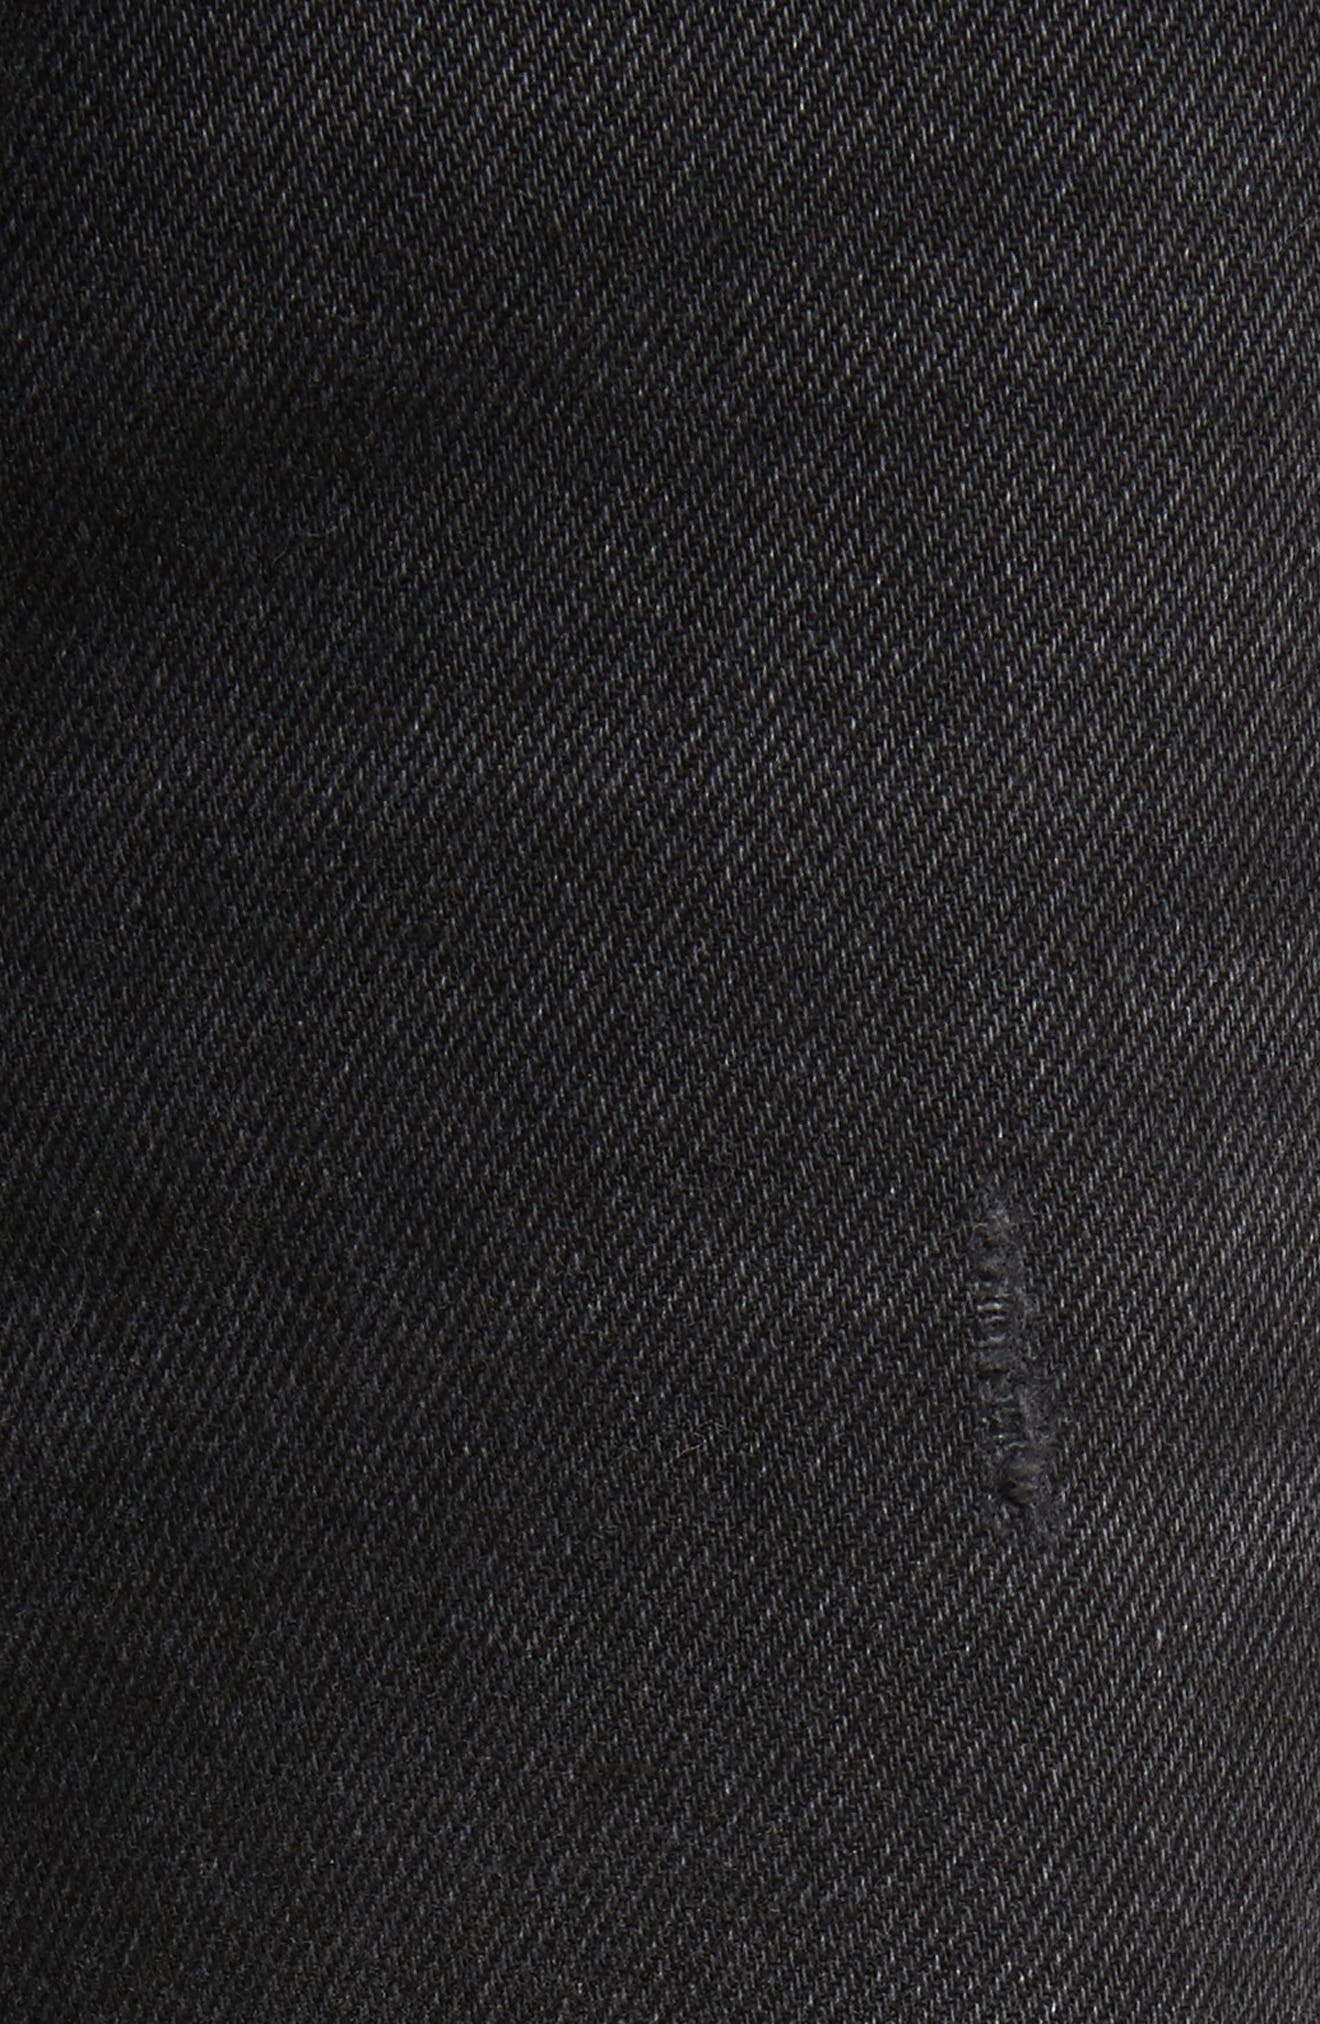 Karolina Ripped Rigid High Waist Skinny Jeans,                             Alternate thumbnail 5, color,                             TRAVELIN BAND